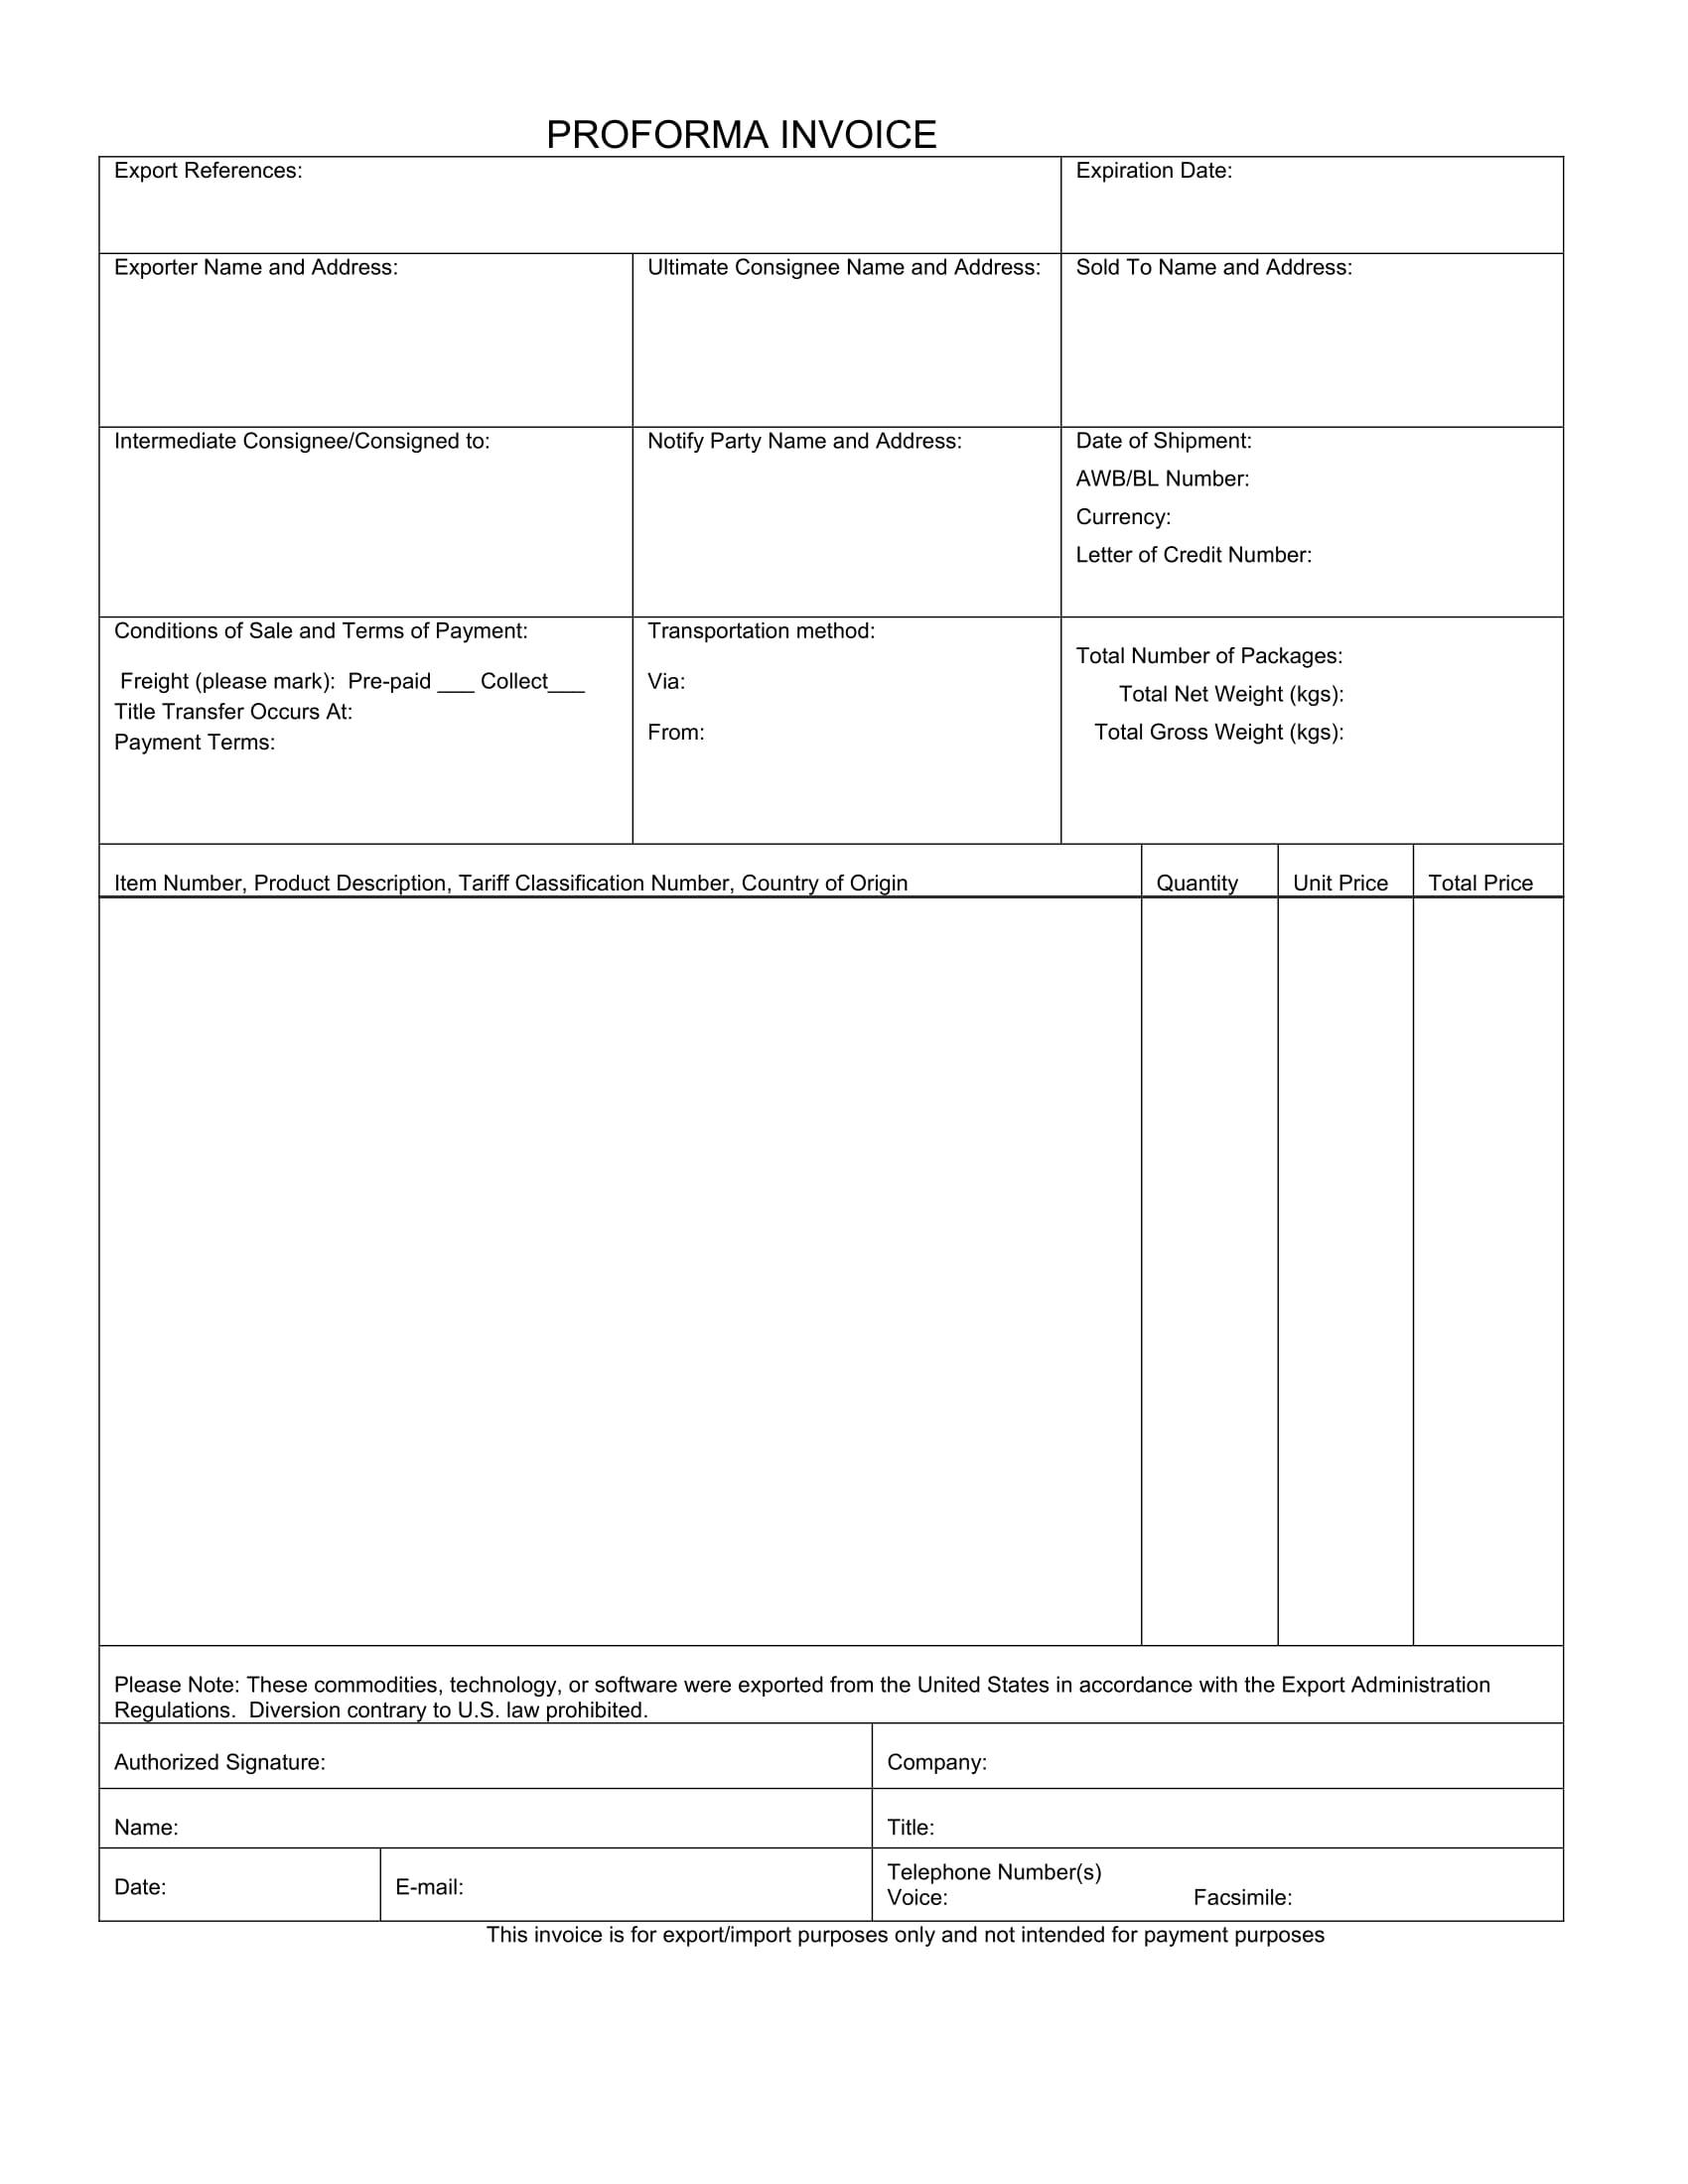 generic pro forma invoice example